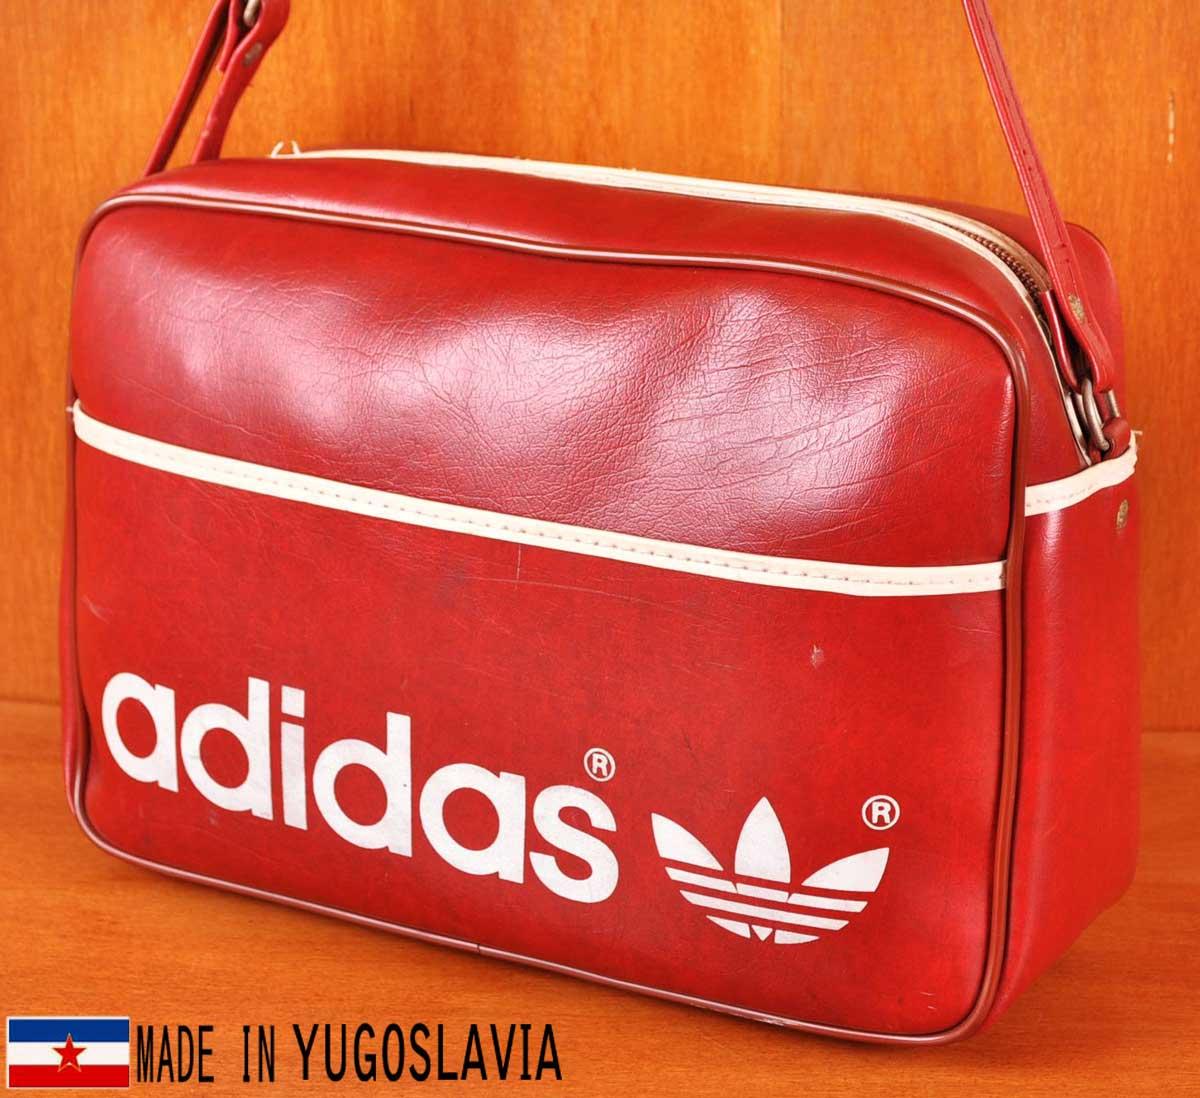 309f32b9e78 Vintage 1970s Yugoslavian-made / adidas adidas / Sport shoulder bag / red ×  white ...